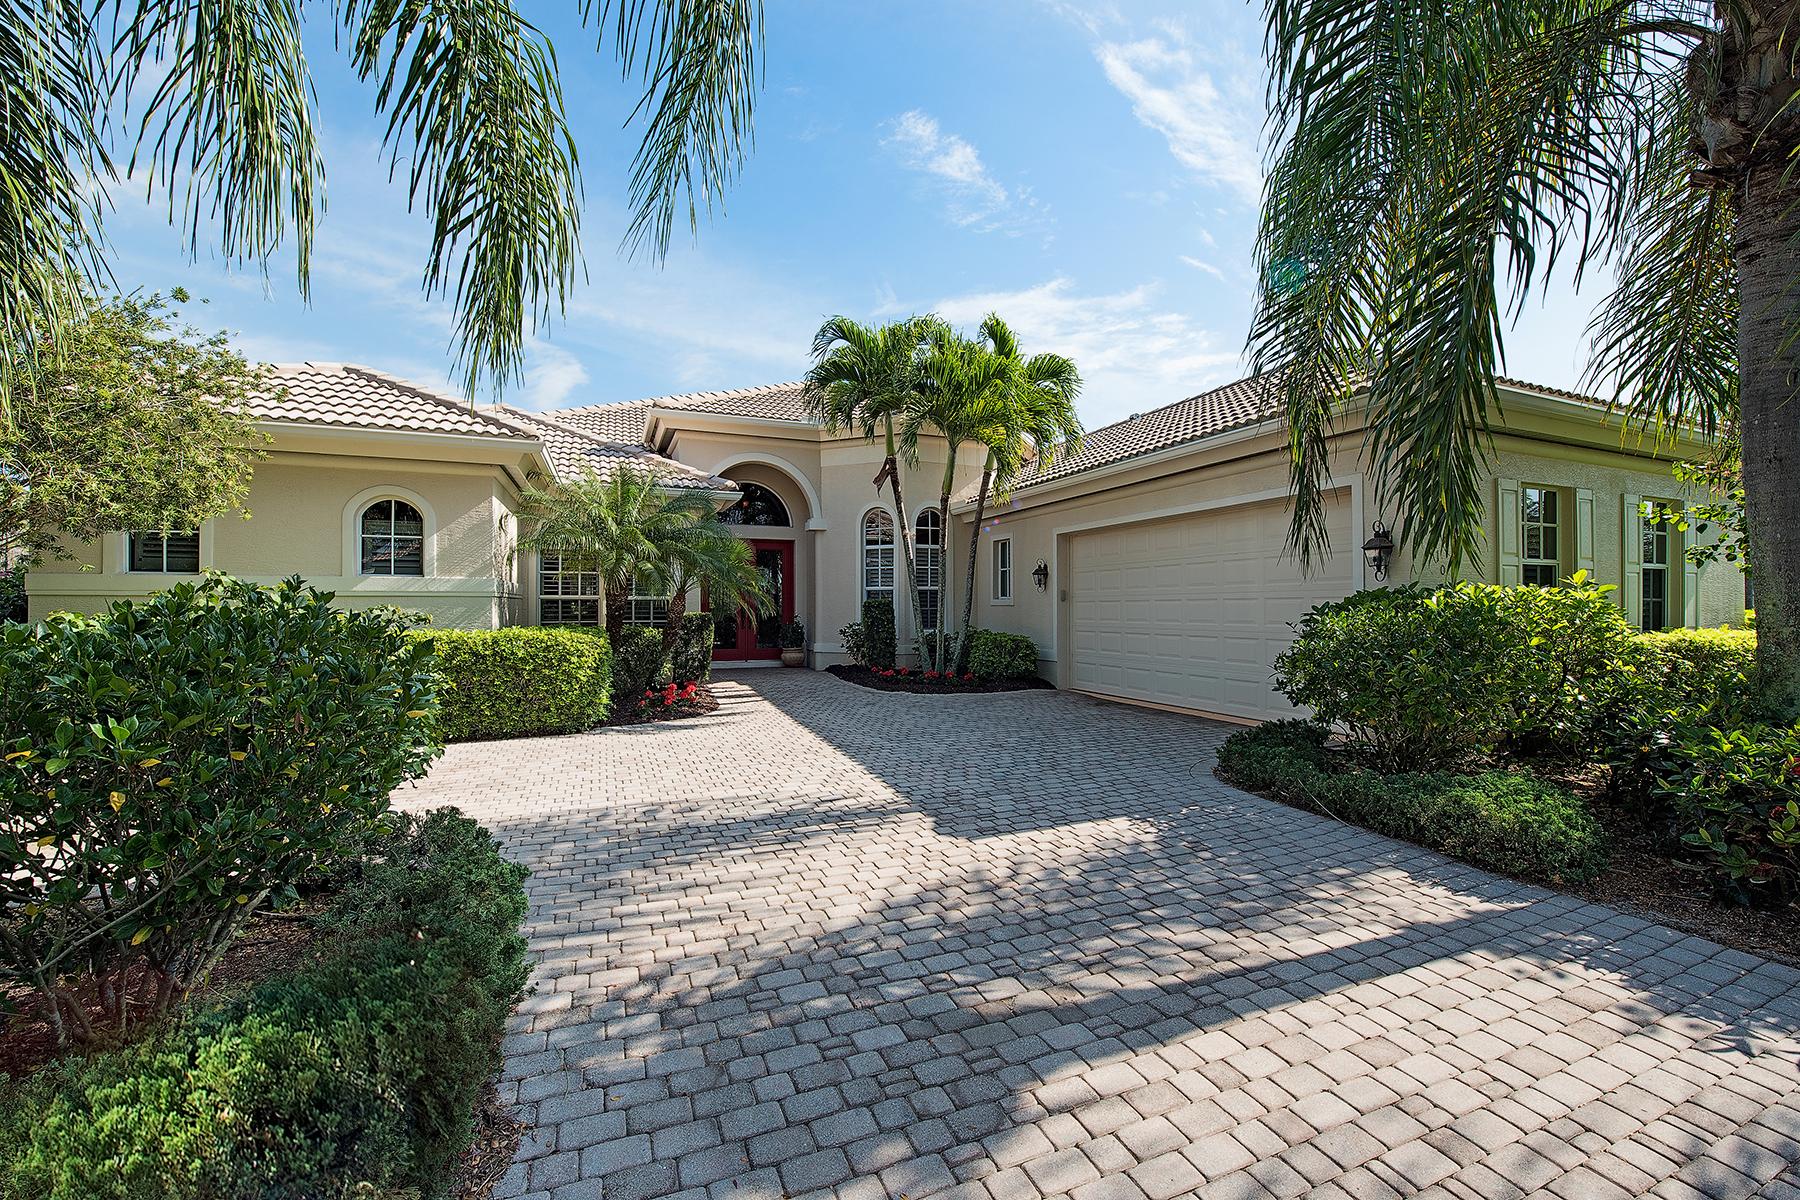 Moradia para Venda às CEDAR GLEN 9110 Hollow Pine Dr Estero, Florida, 34135 Estados Unidos